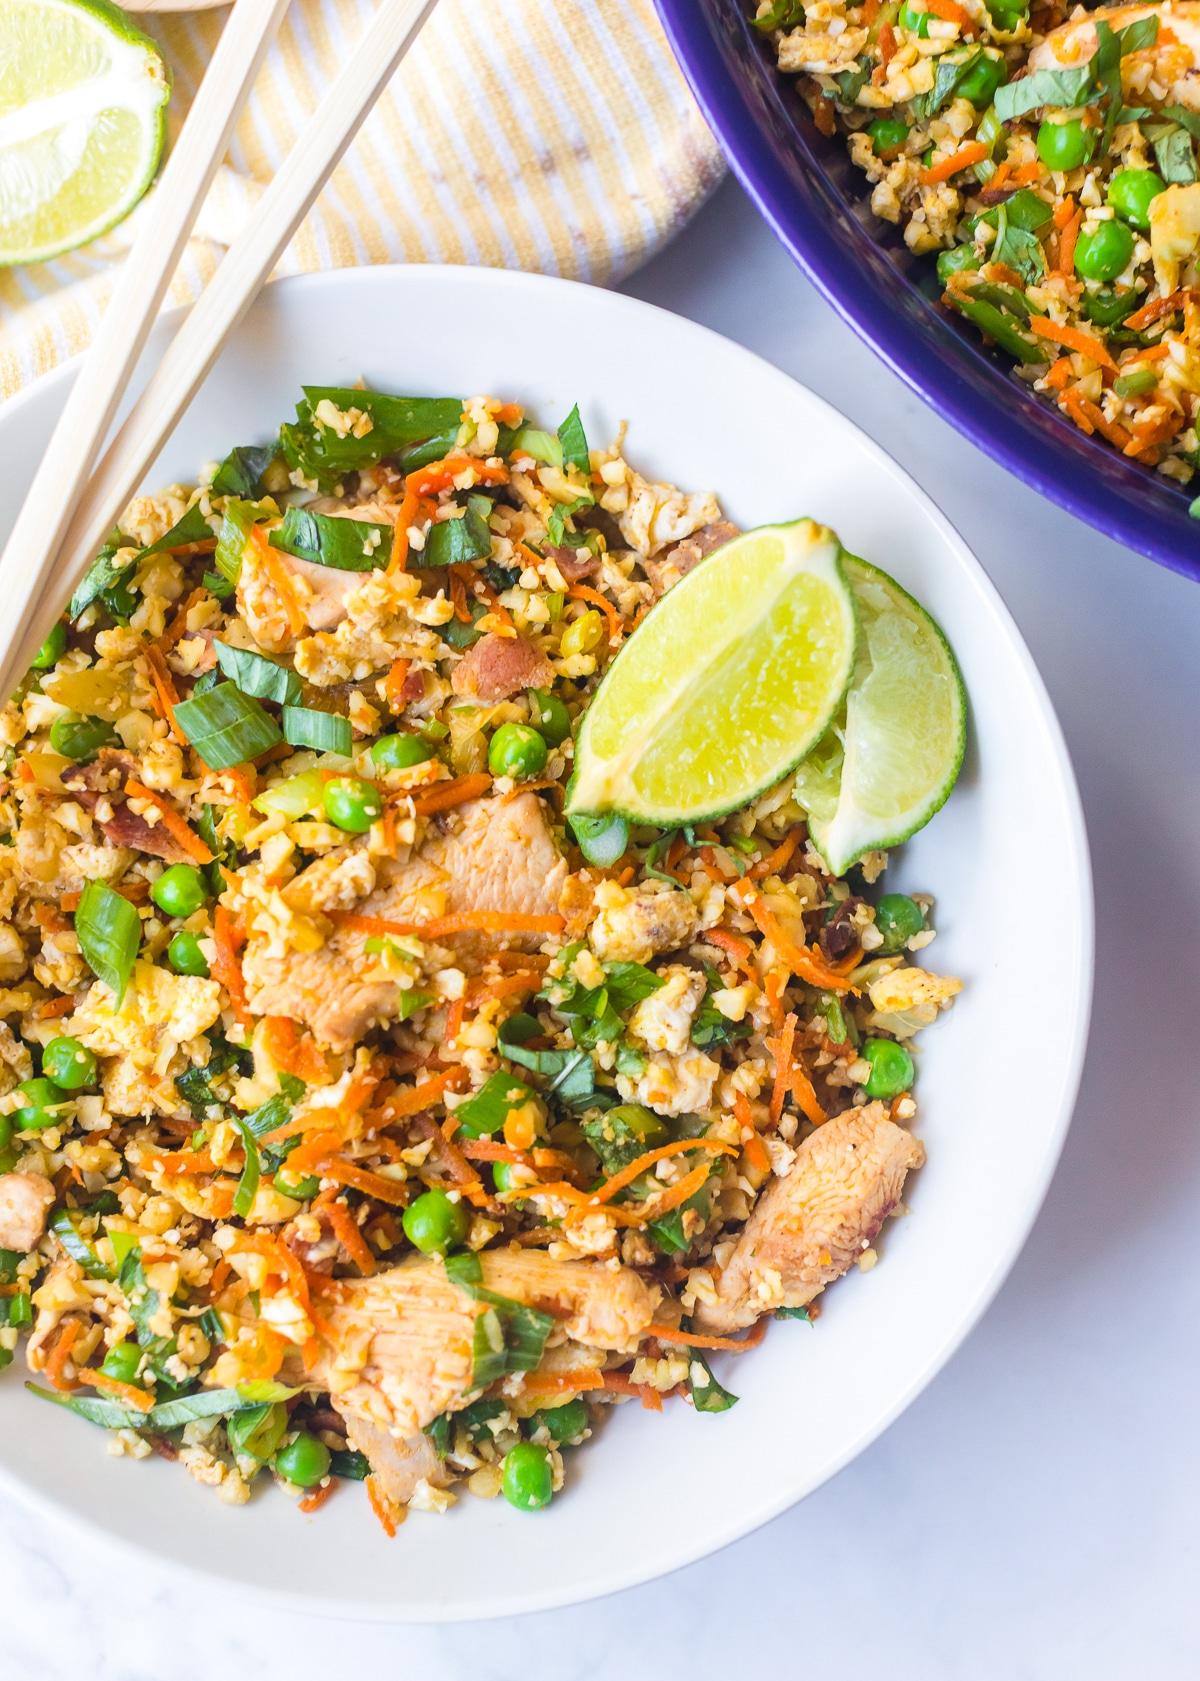 Paleo Cauliflower Chicken Fried Rice Recipe #ASpicyPerspective #cauliflower #chicken #paleo #keto #lowcarb